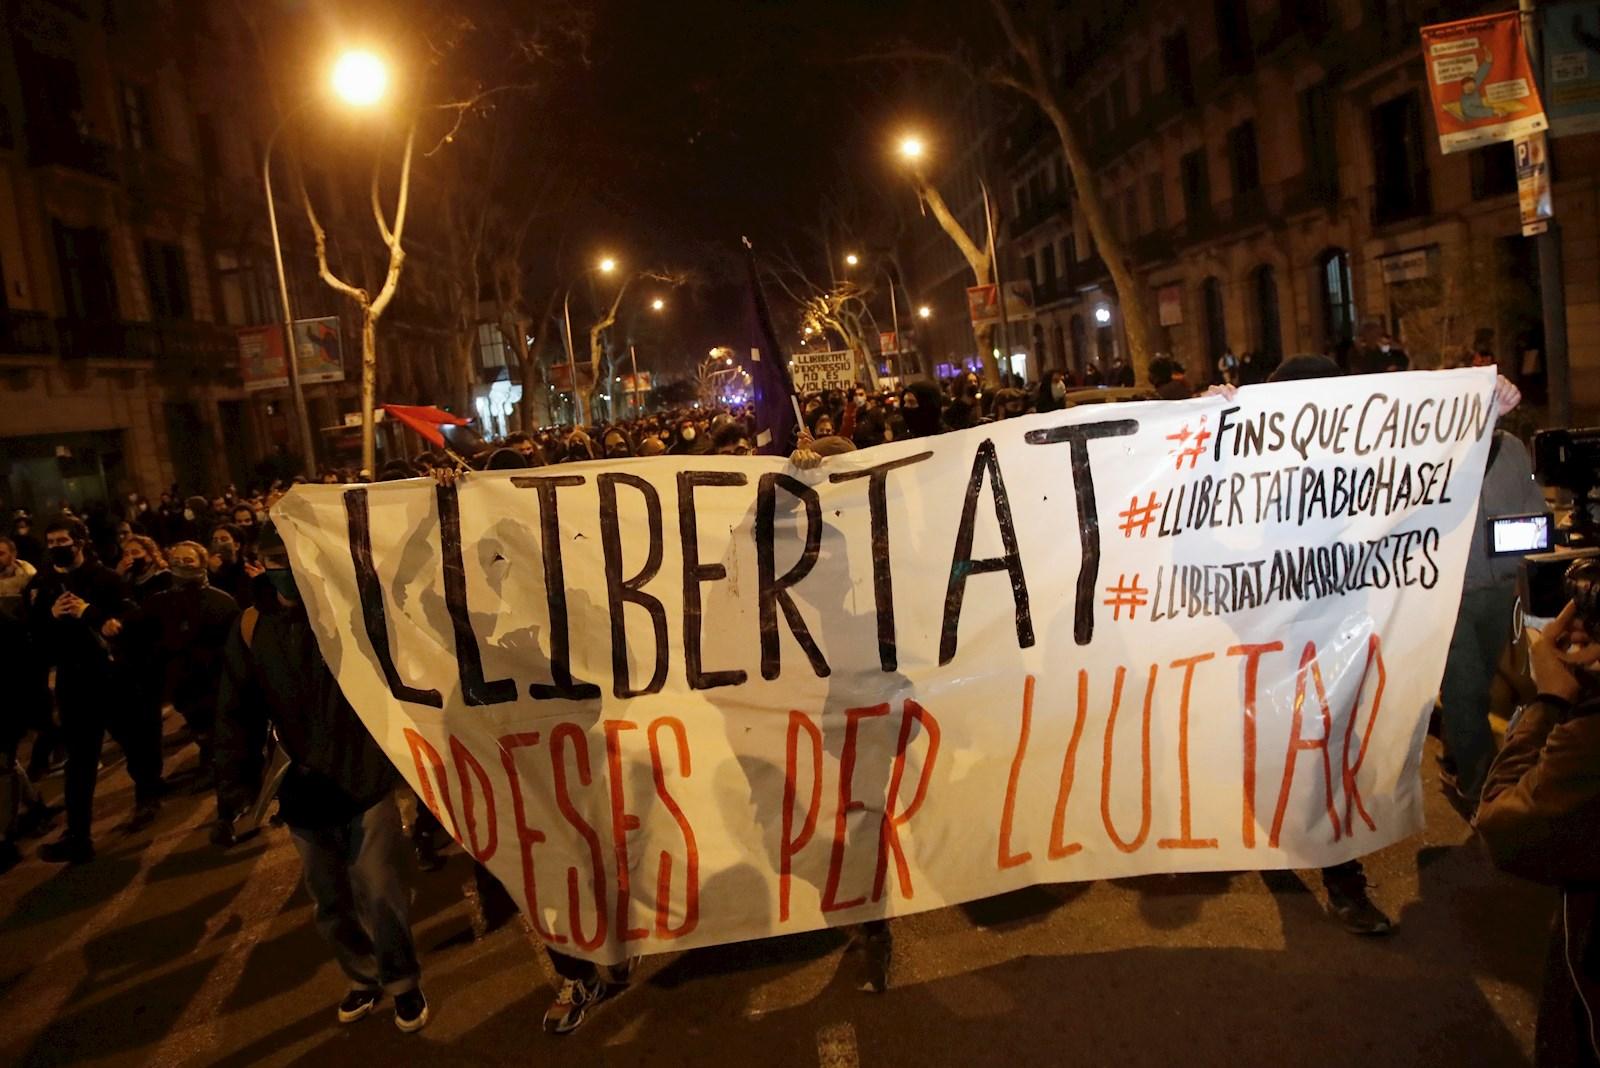 Centenares de personas se manifiestan este sábado en la plaza Tetuán de Barcelona. EFE/ Marta Pérez